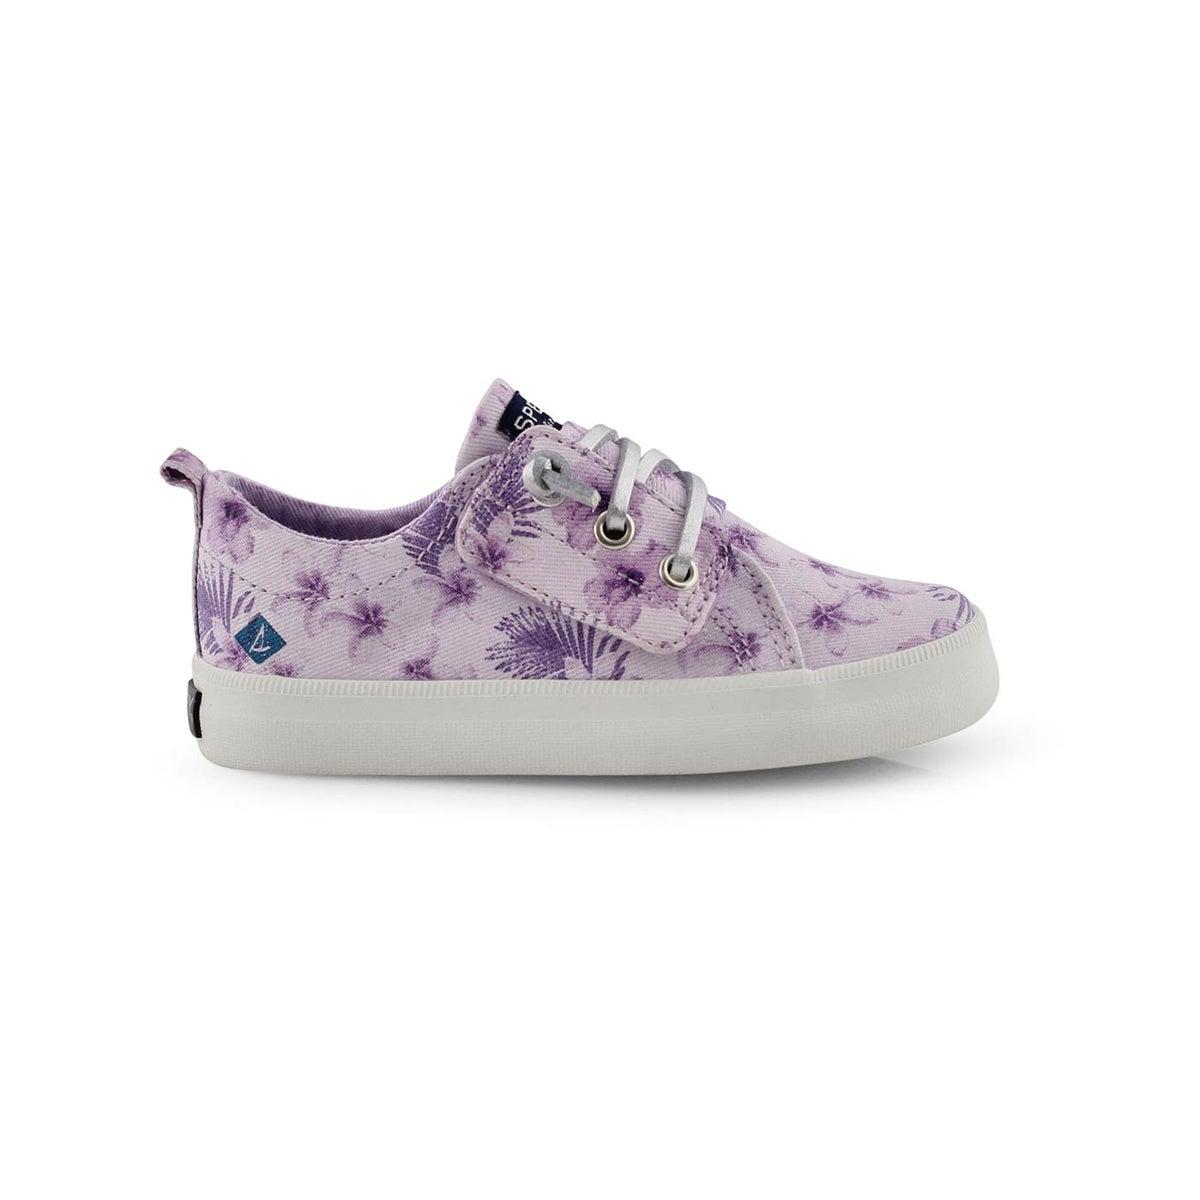 Inf-g Crest Vibe purple print sneaker